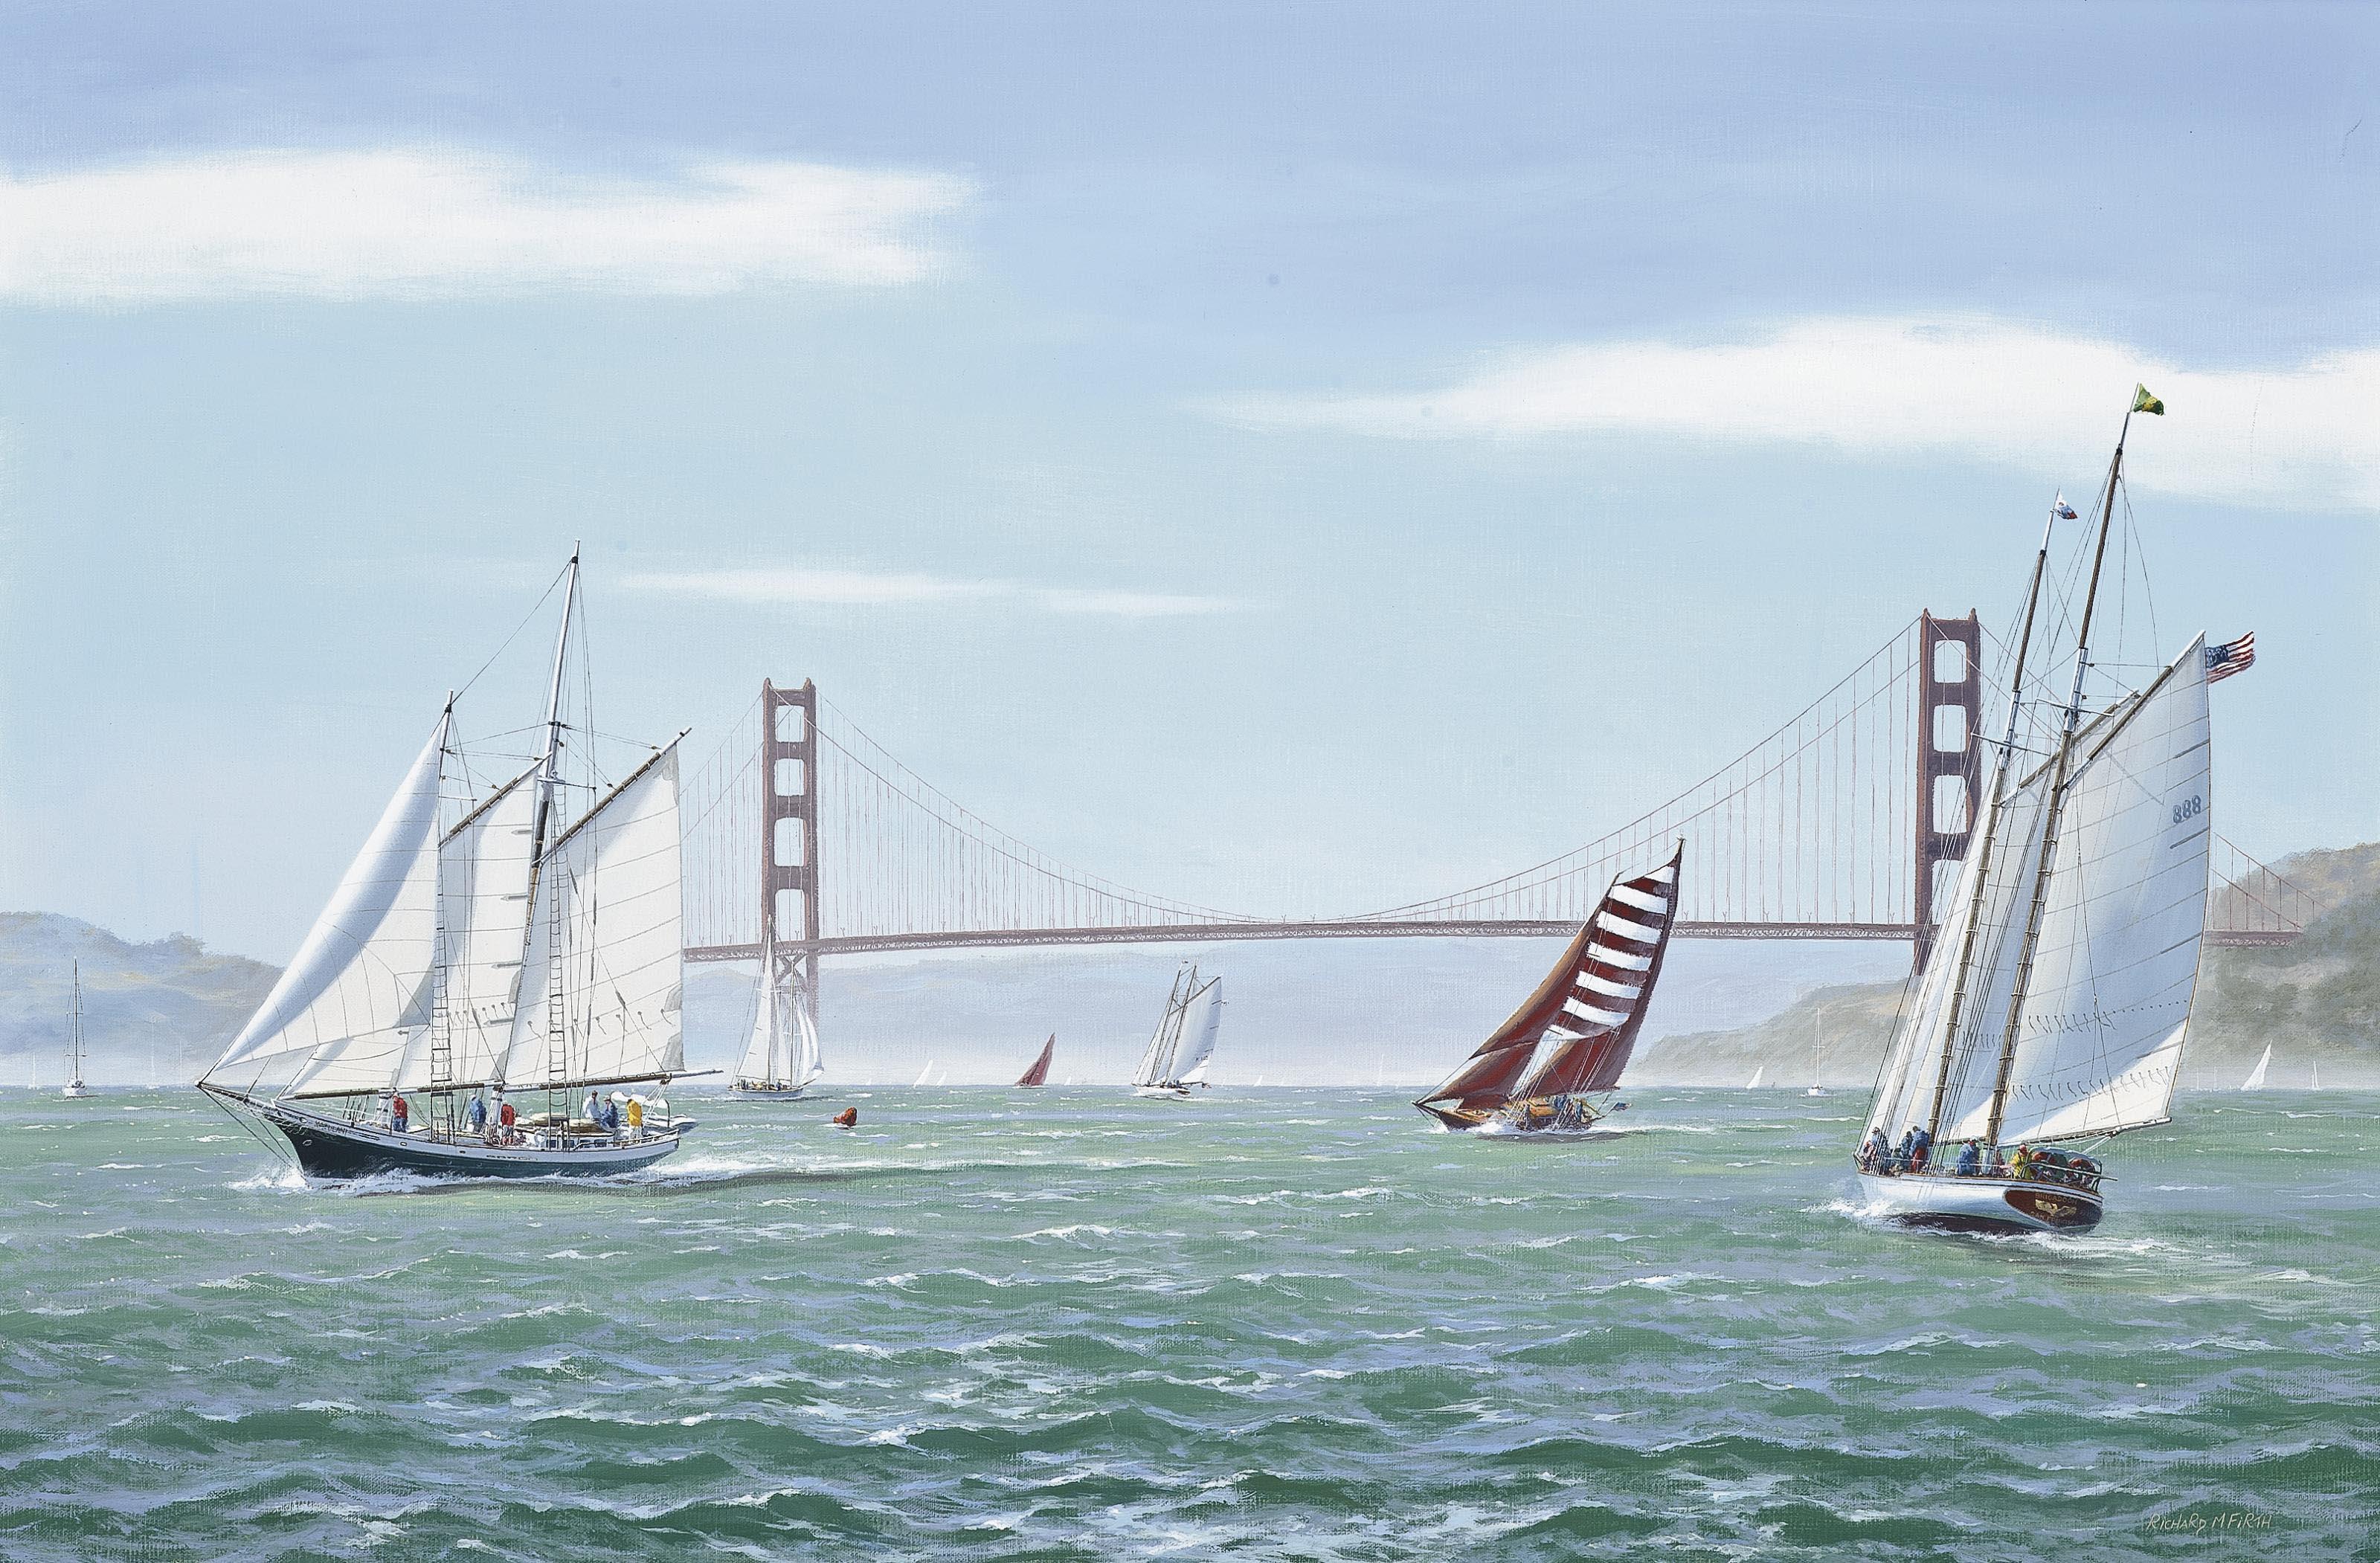 The Great San Francisco Schooner Race: Brigadoon, Kaiulani, Aldebaran, Yankee and Condessa Del Mar running before the Golden Gate Bridge